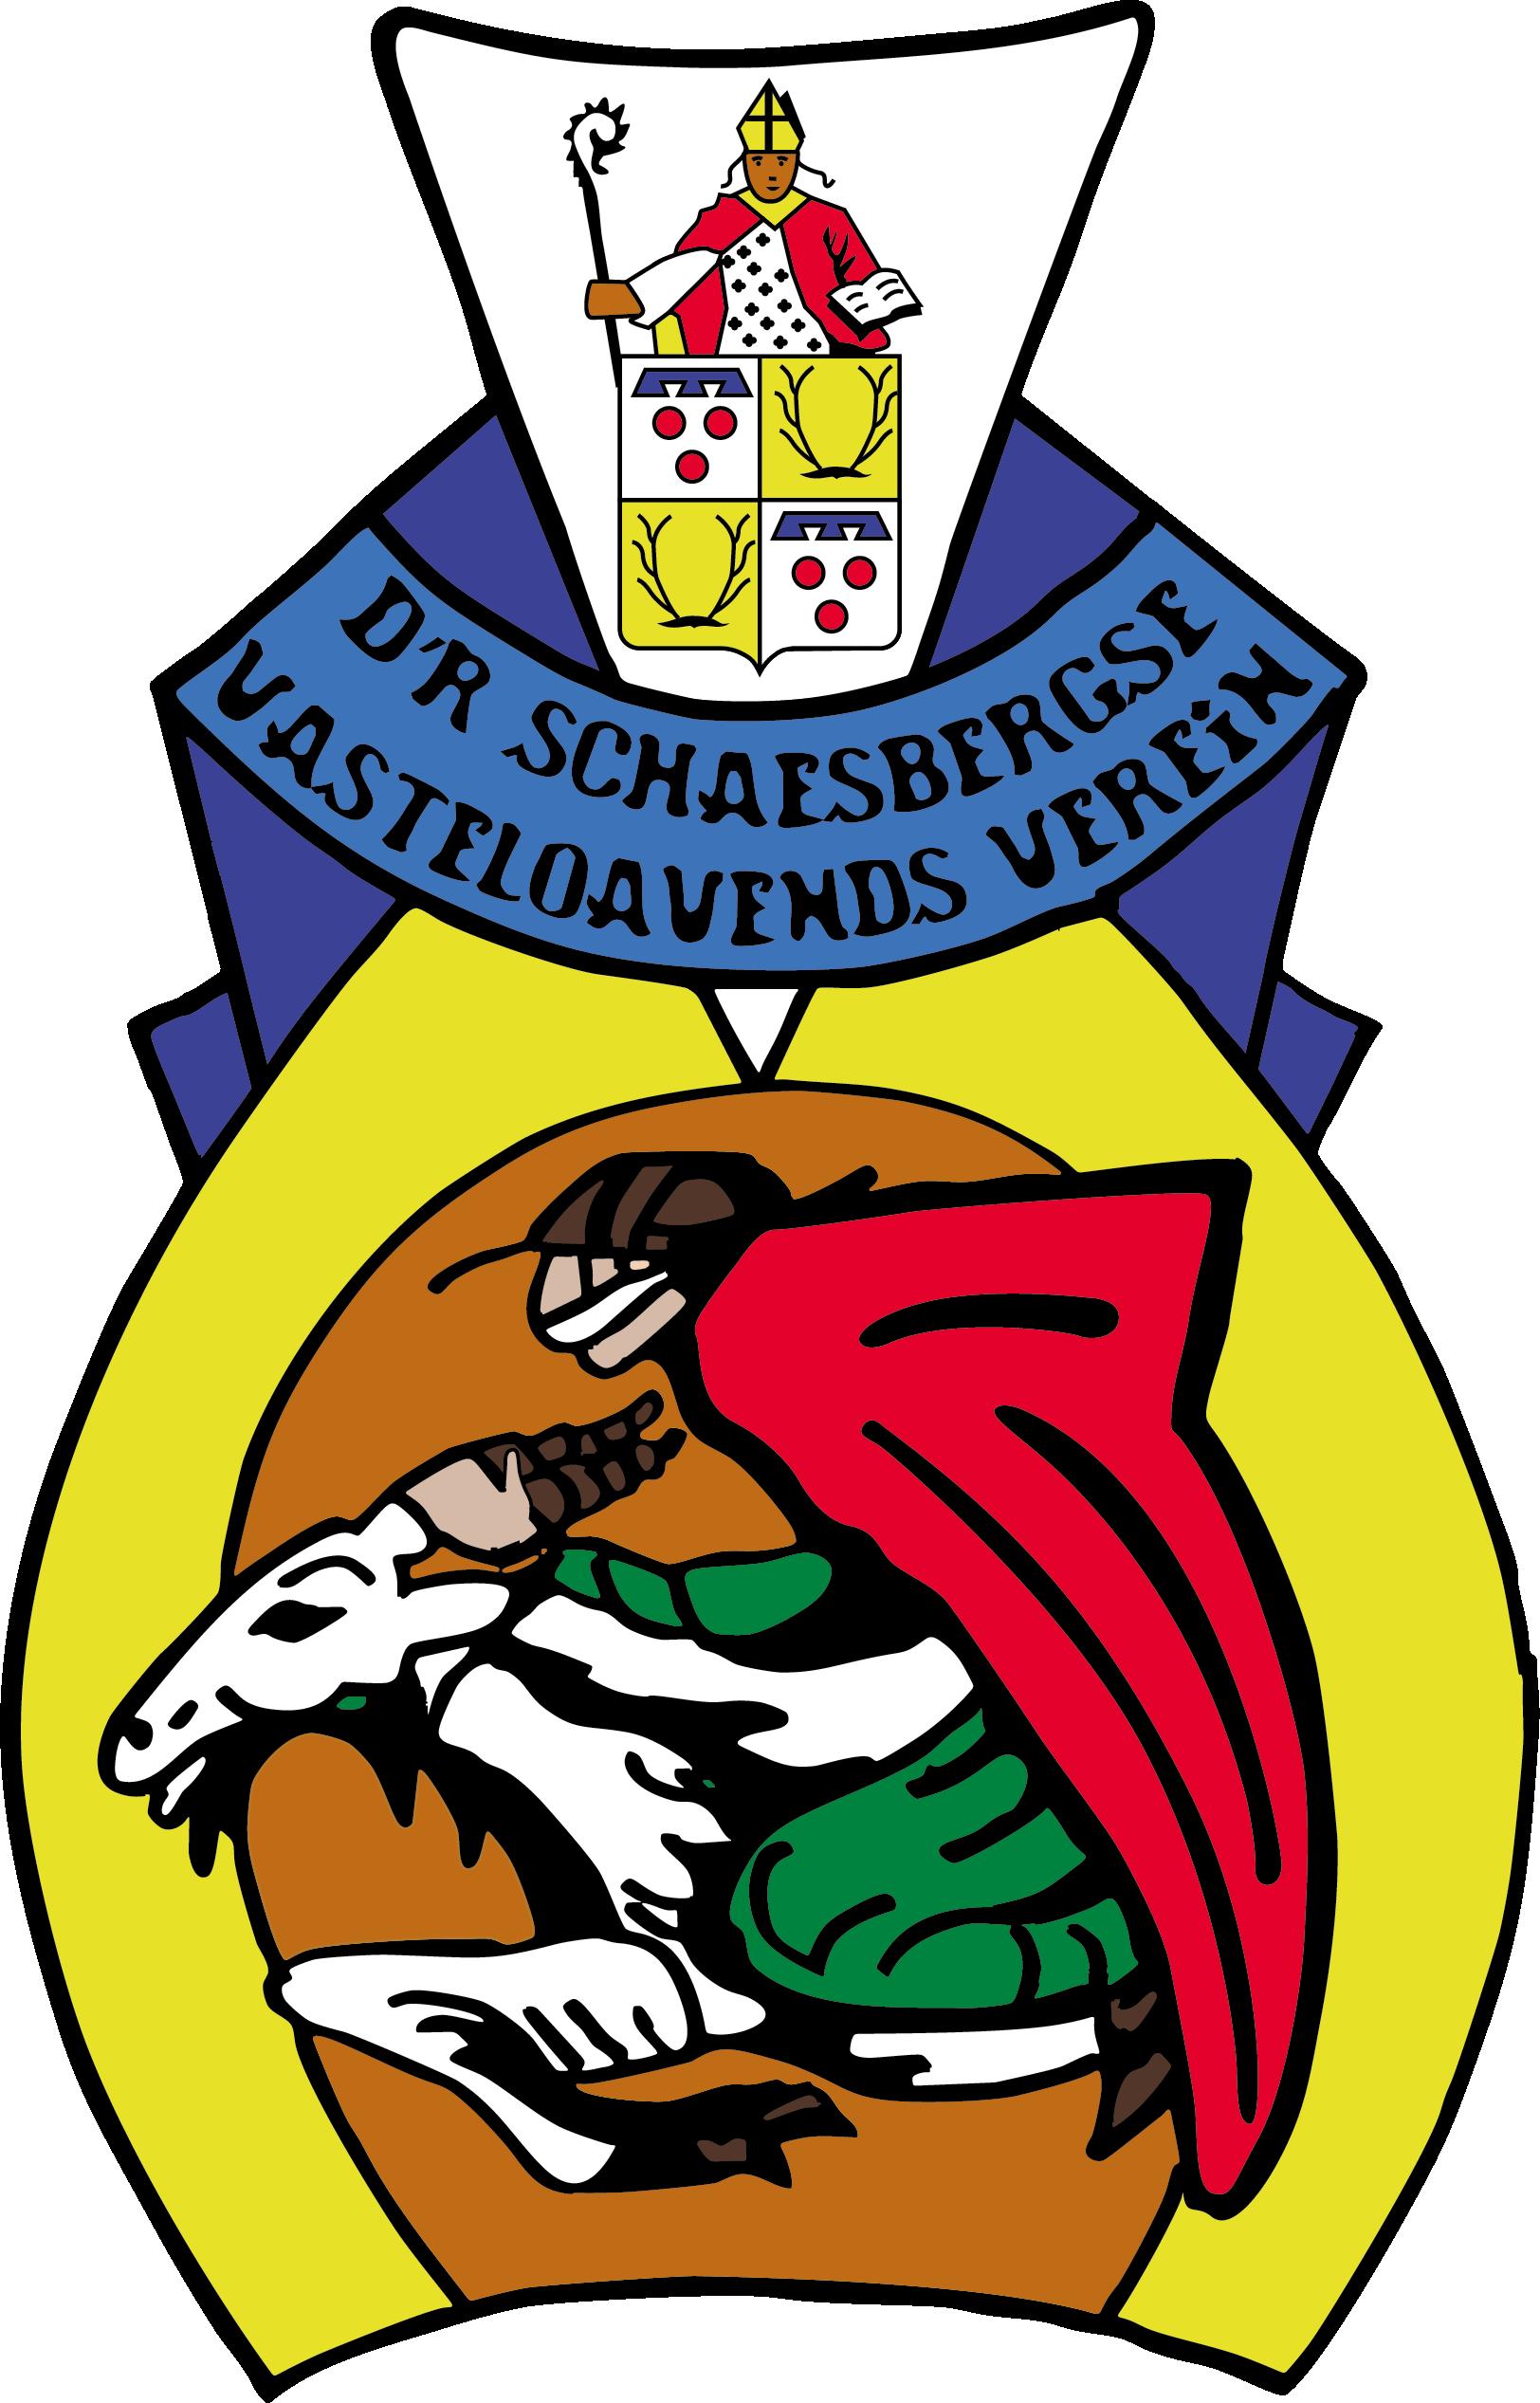 D'r Schaesbergse Vasteloavends Verein